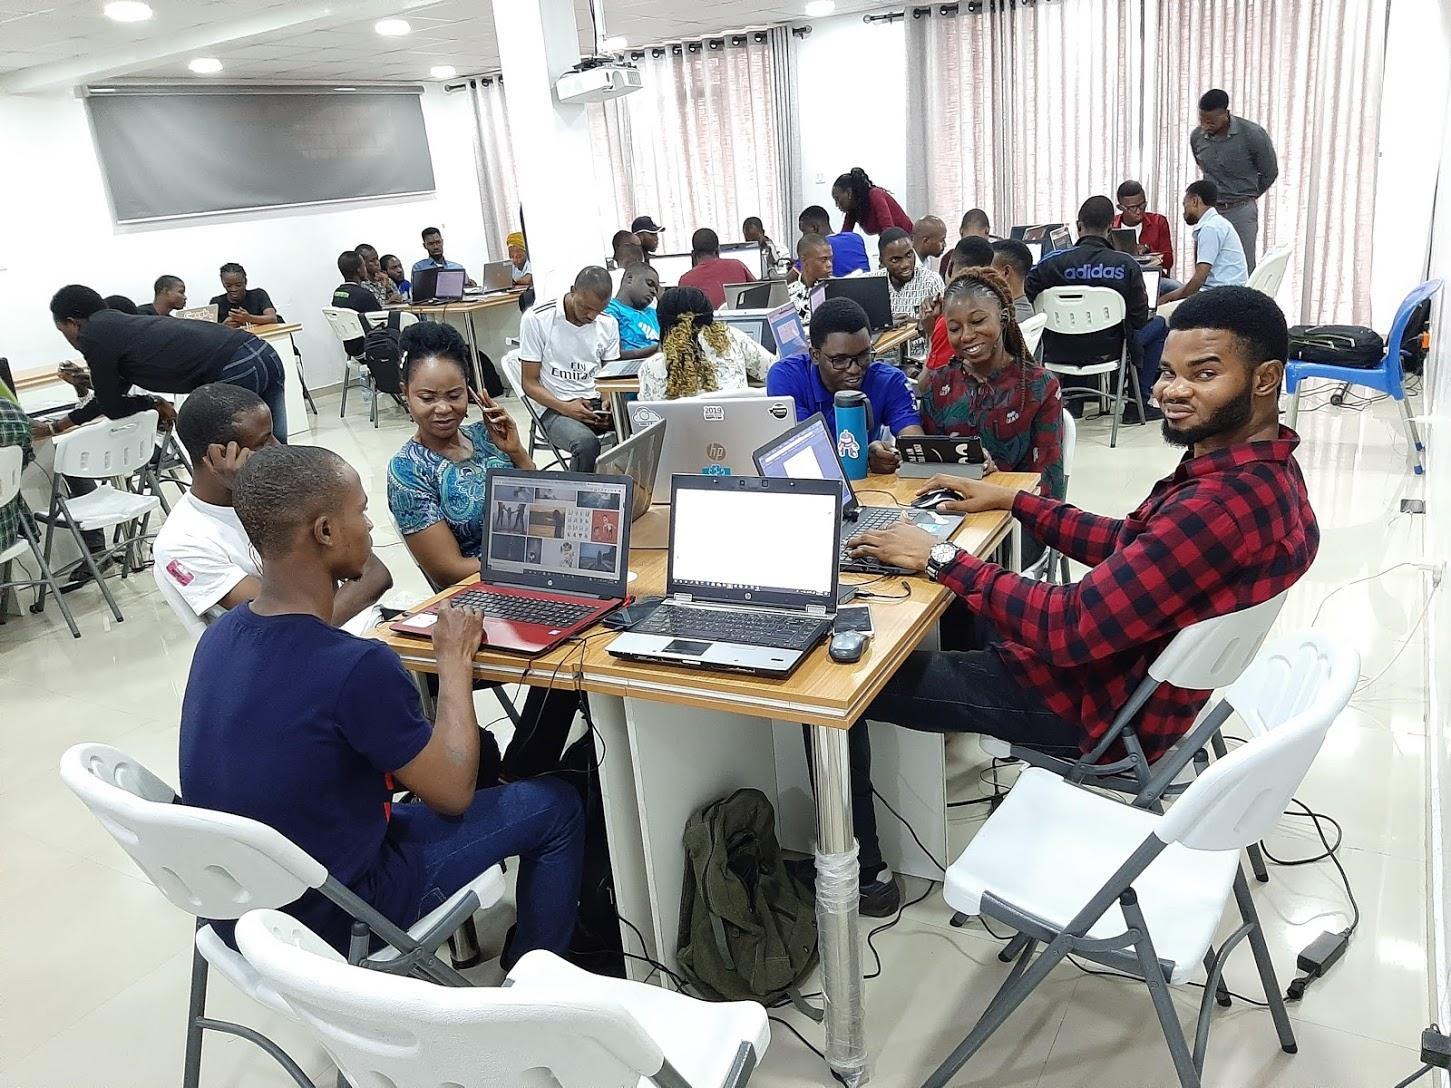 From 2019 Lagos doaction hackathon